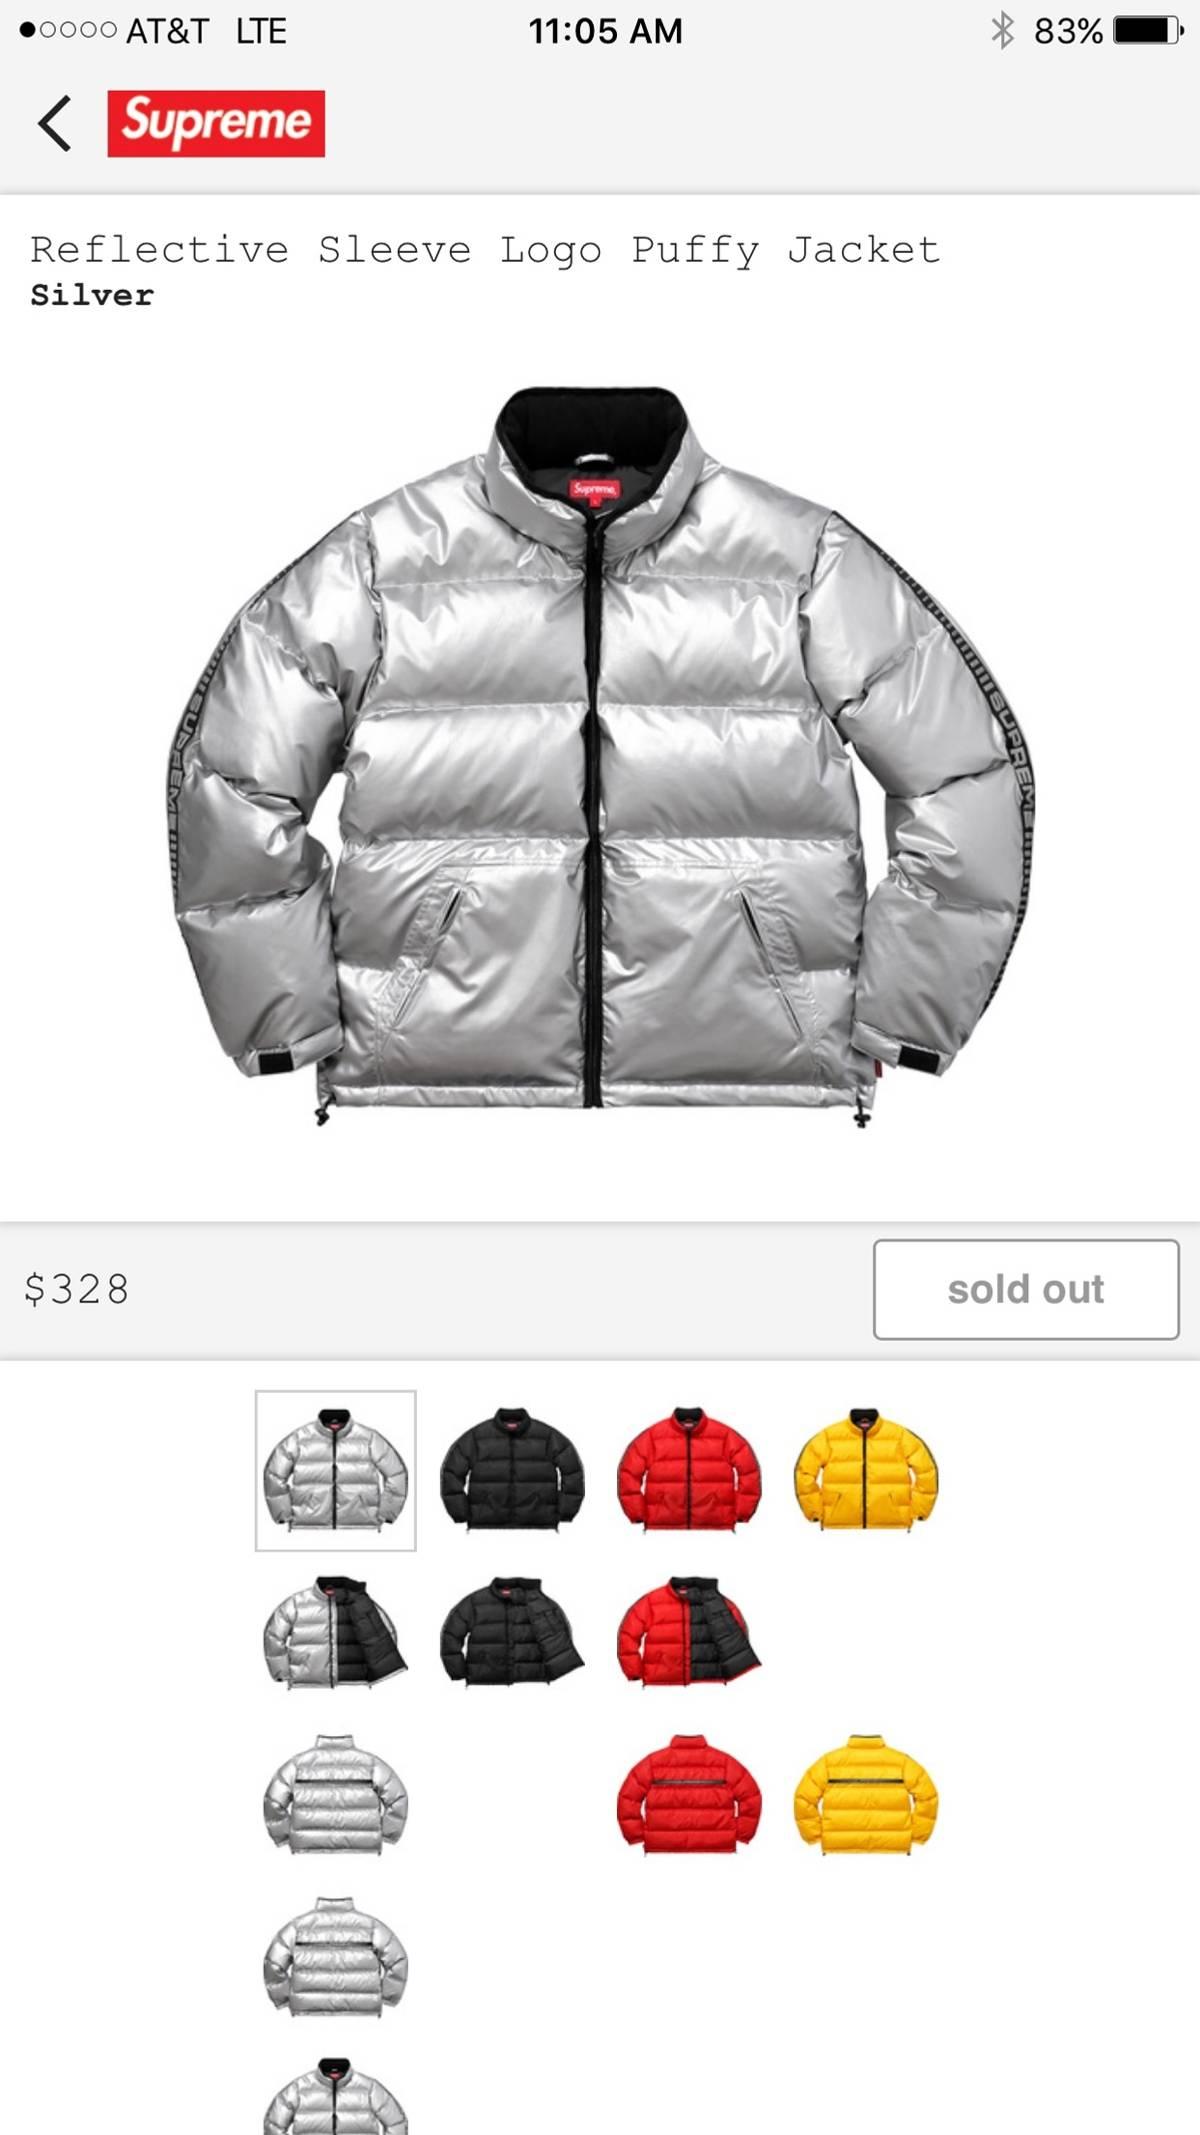 a50067b3 Supreme Reflective Sleeve Logo Puffy Jacket | Grailed